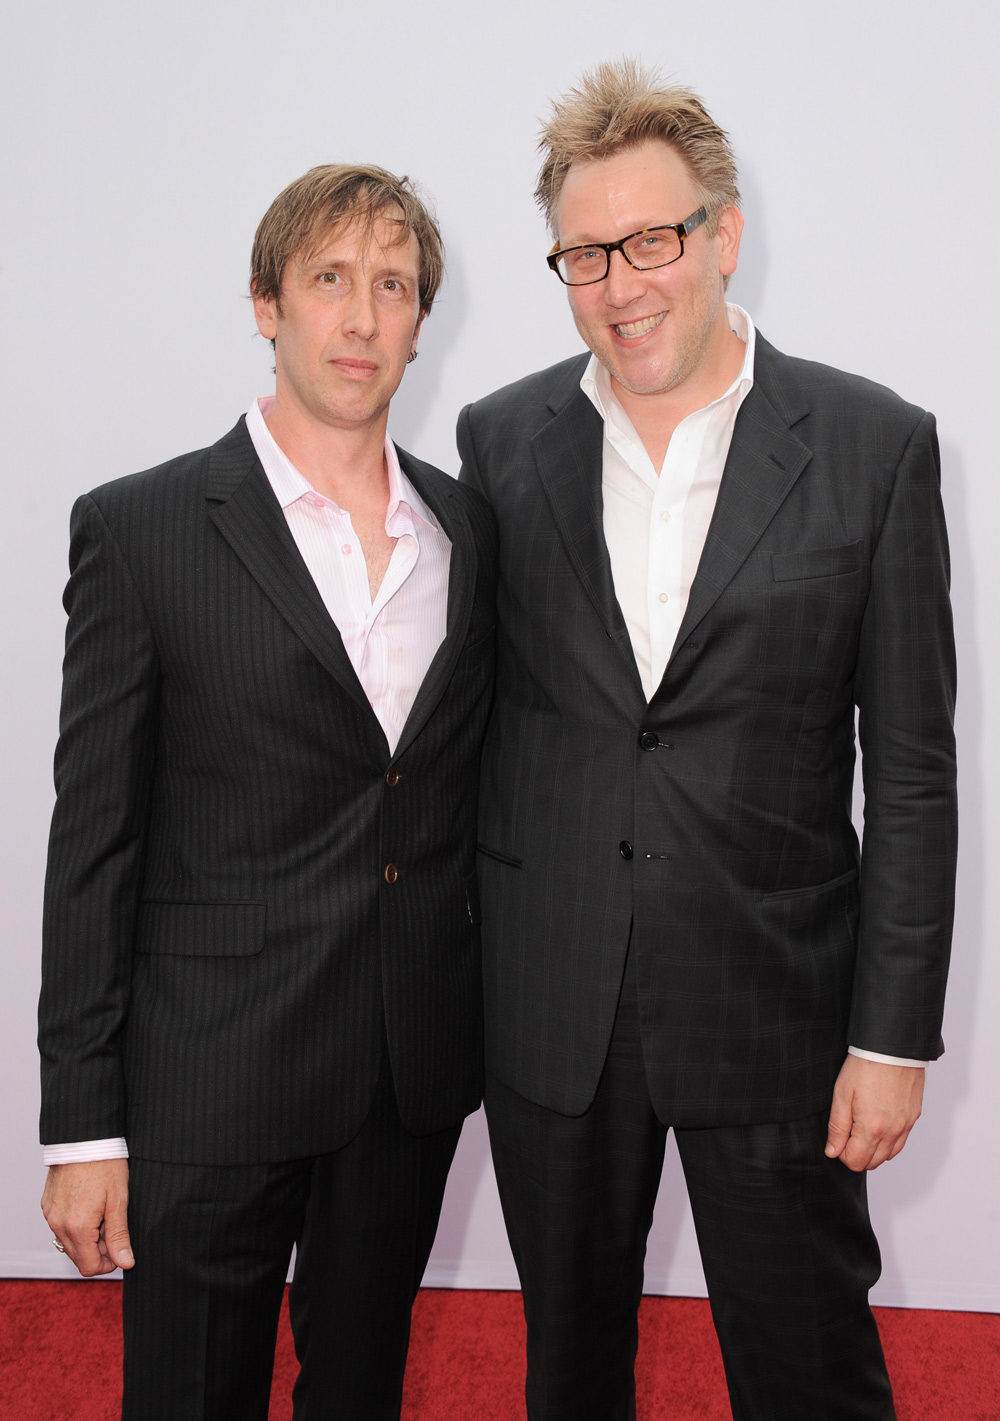 Jon Hoeber and Eric Hoeber